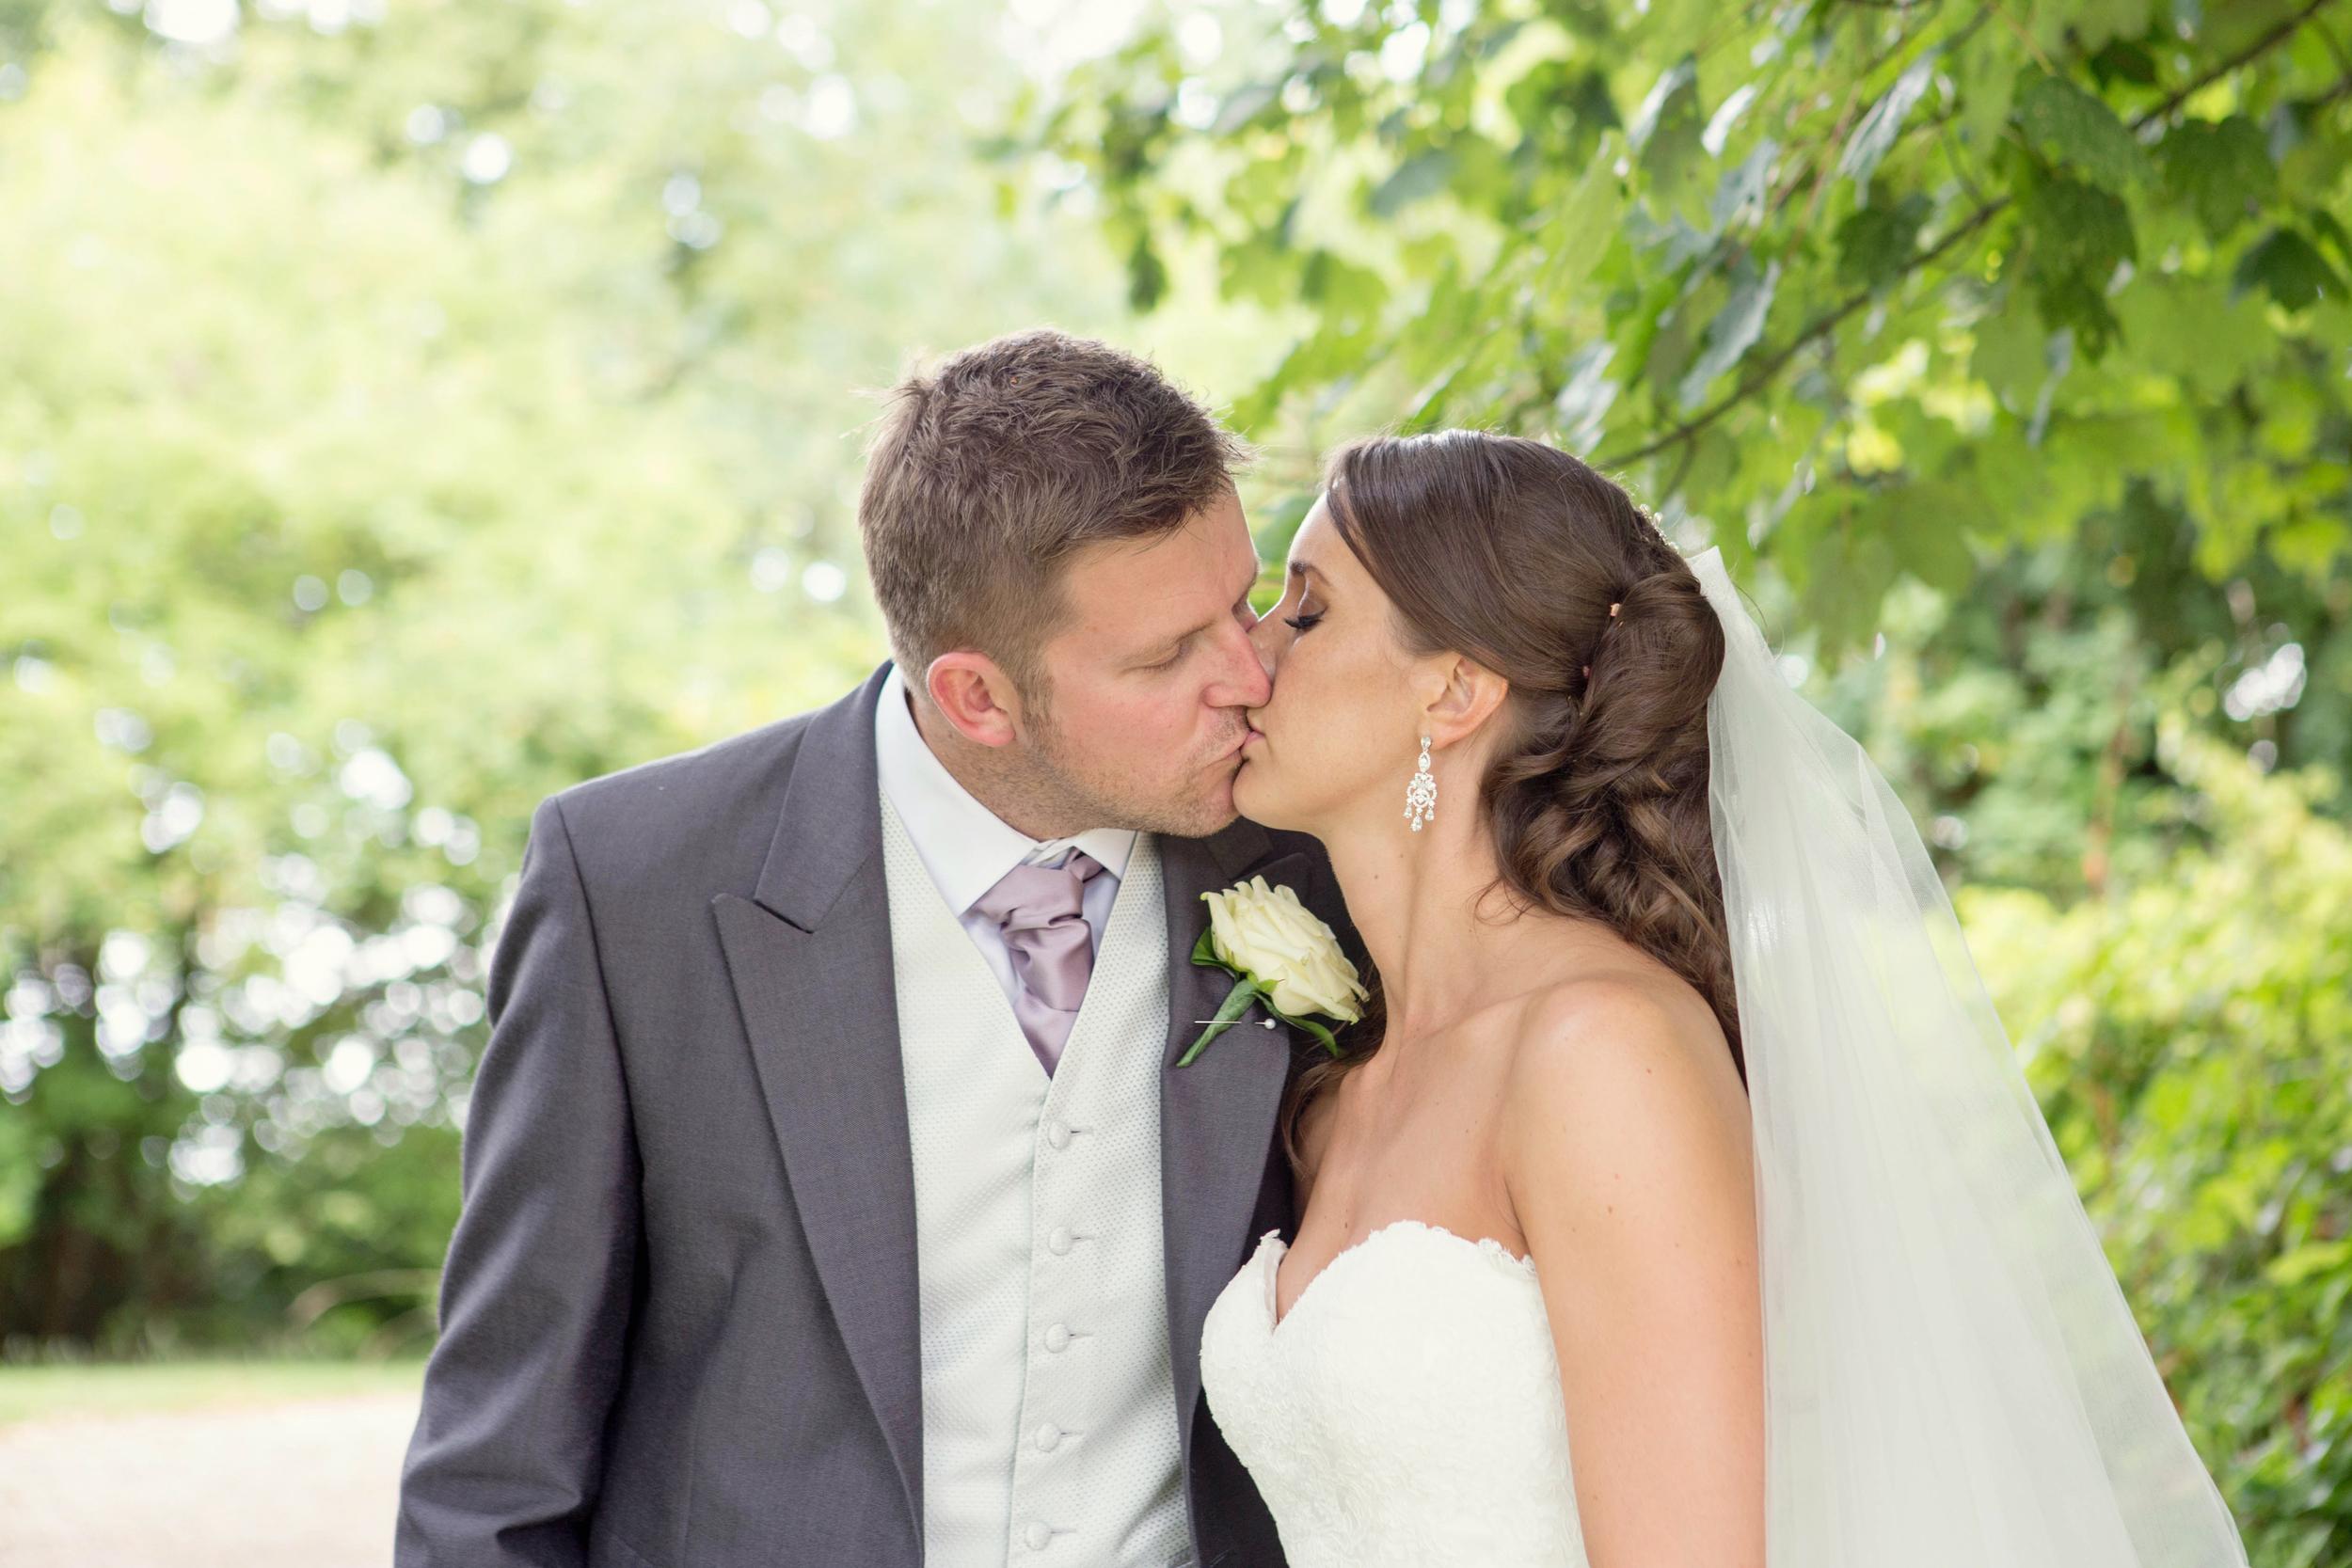 Sophie Evans Photography, Warwickshire Wedding Photography, Welcombe Hotel  (51).jpg